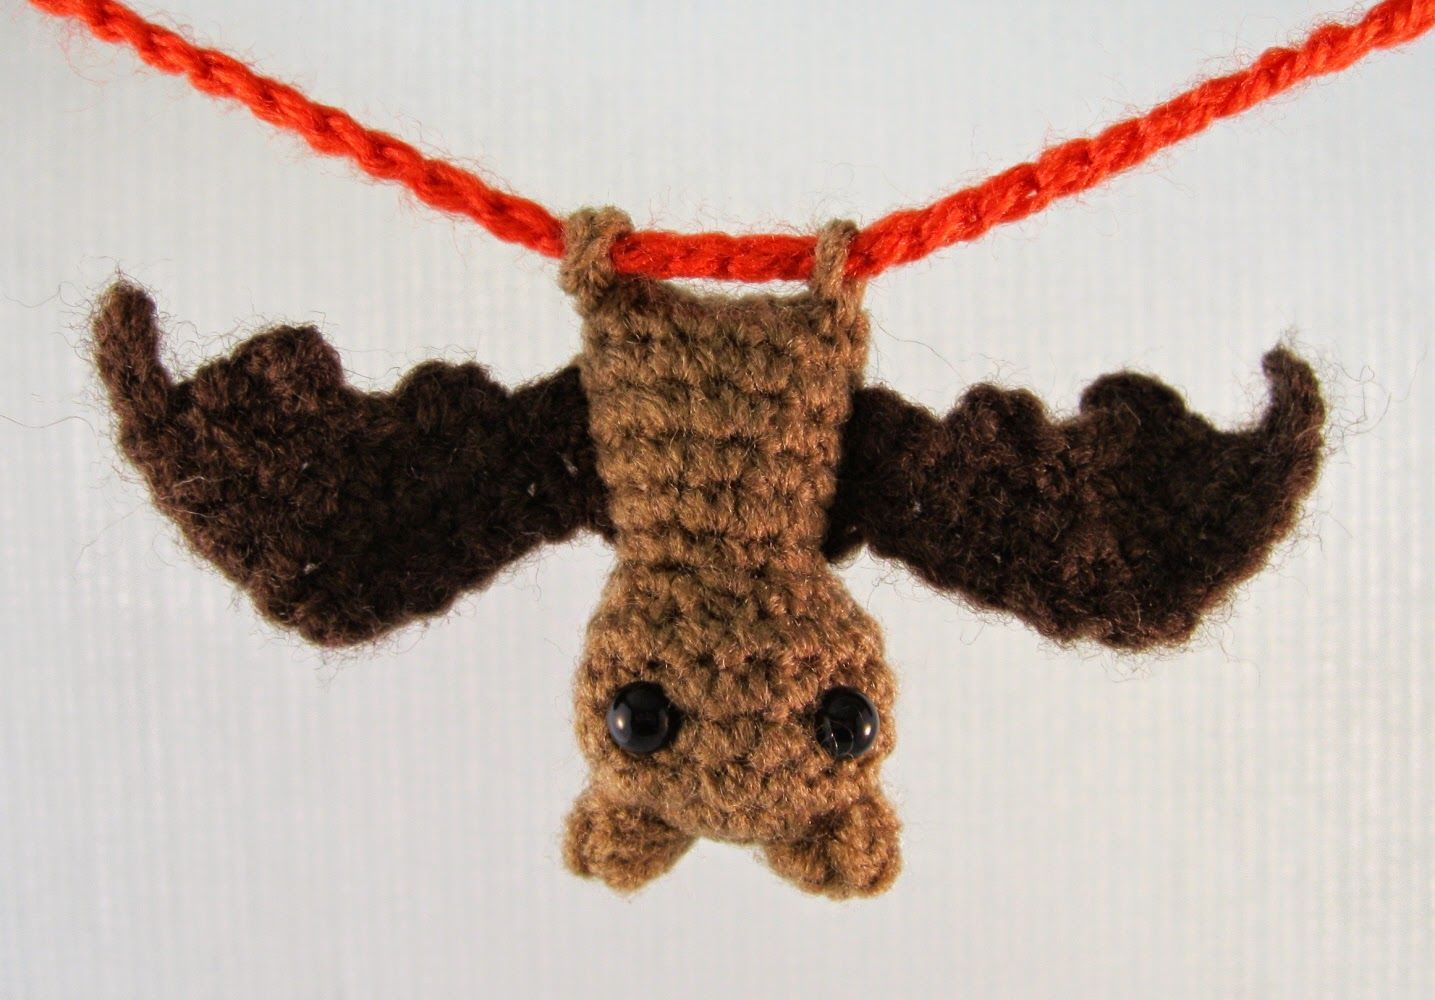 Free Amigurumi Patterns Uk : Itty bitty bat free amigurumi pattern here lucyravenscar